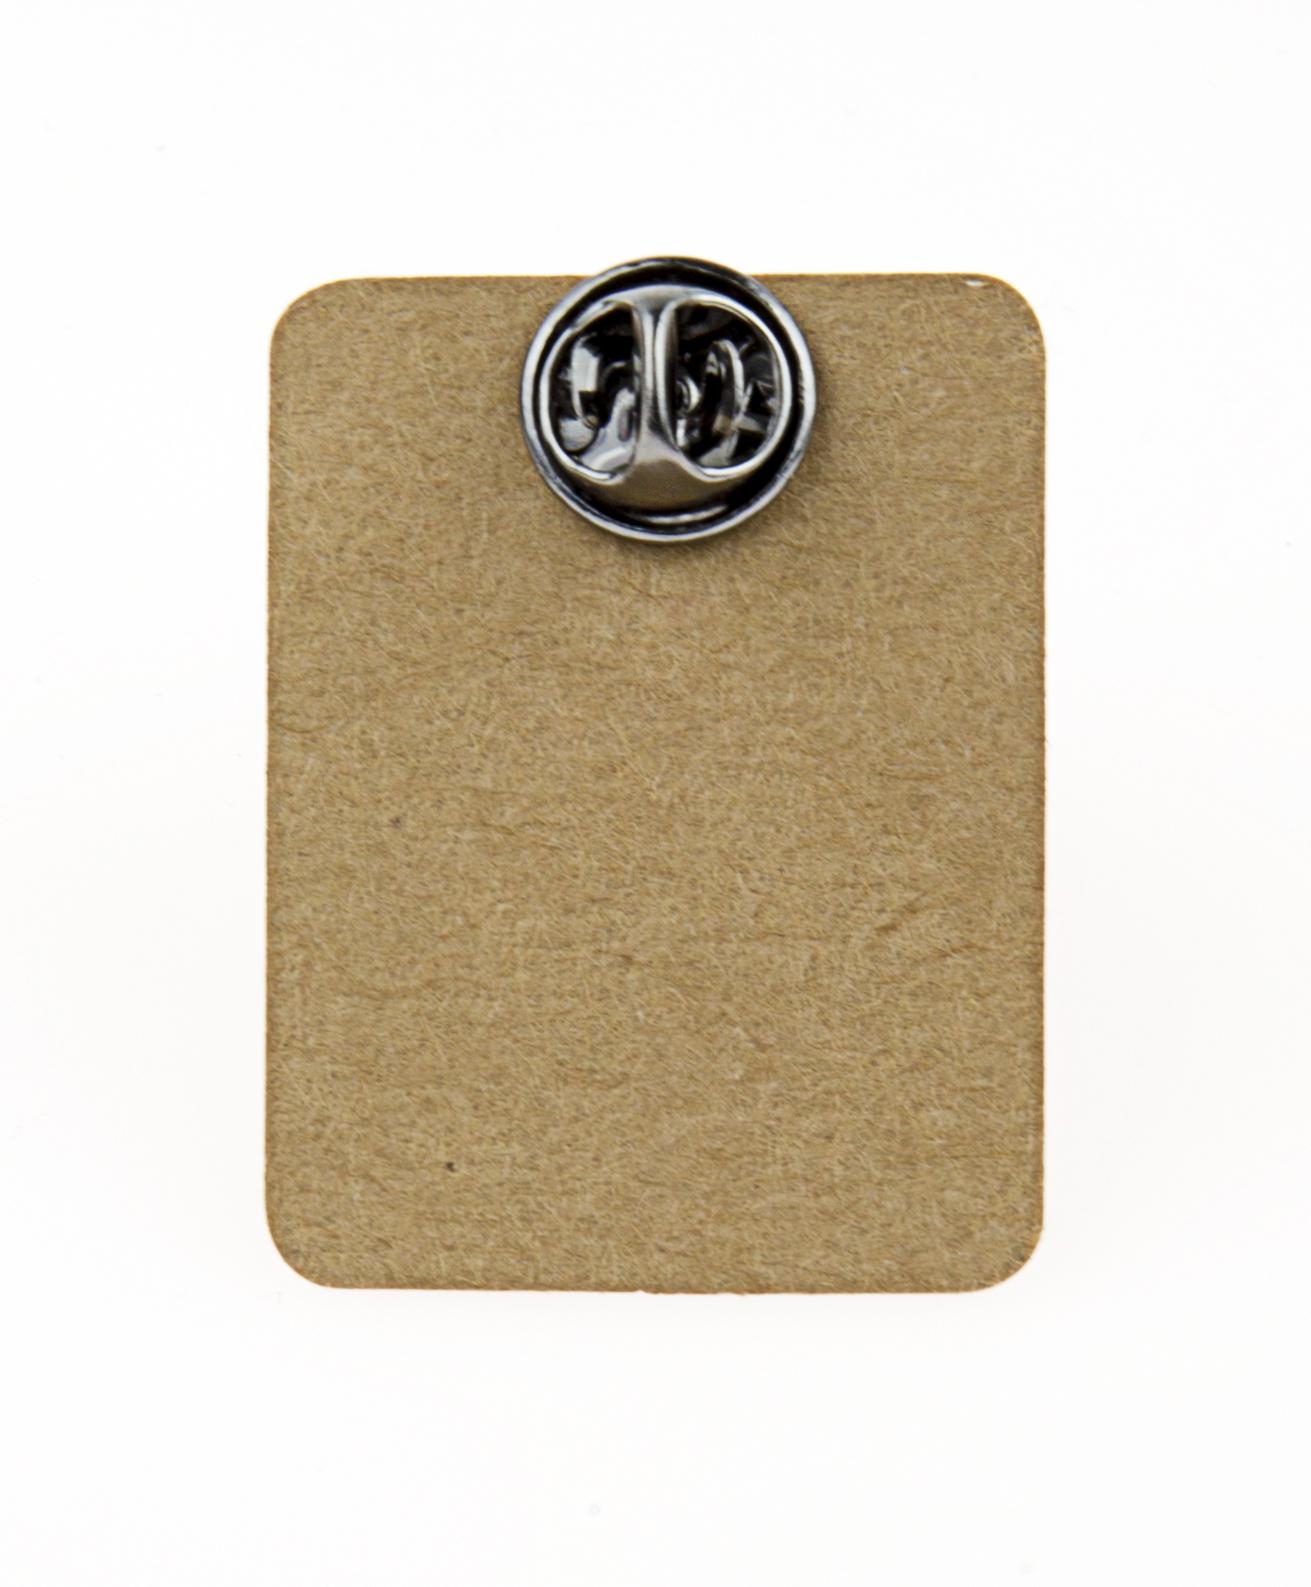 Metal Ufo Light Attack Enamel Pin Badge